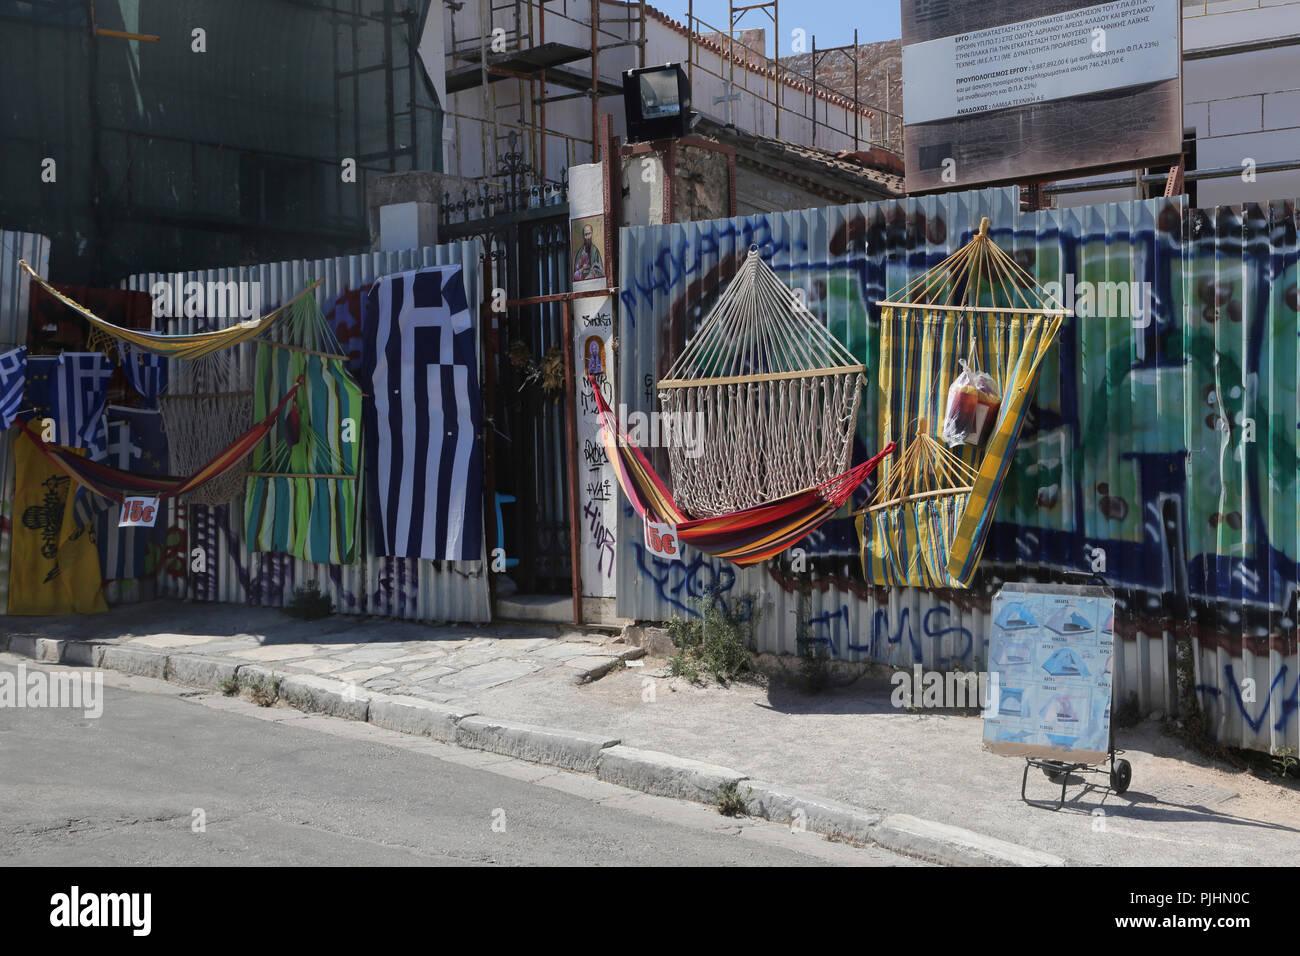 Plaka Athens Greece Greek Hammocks on Sale - Stock Image